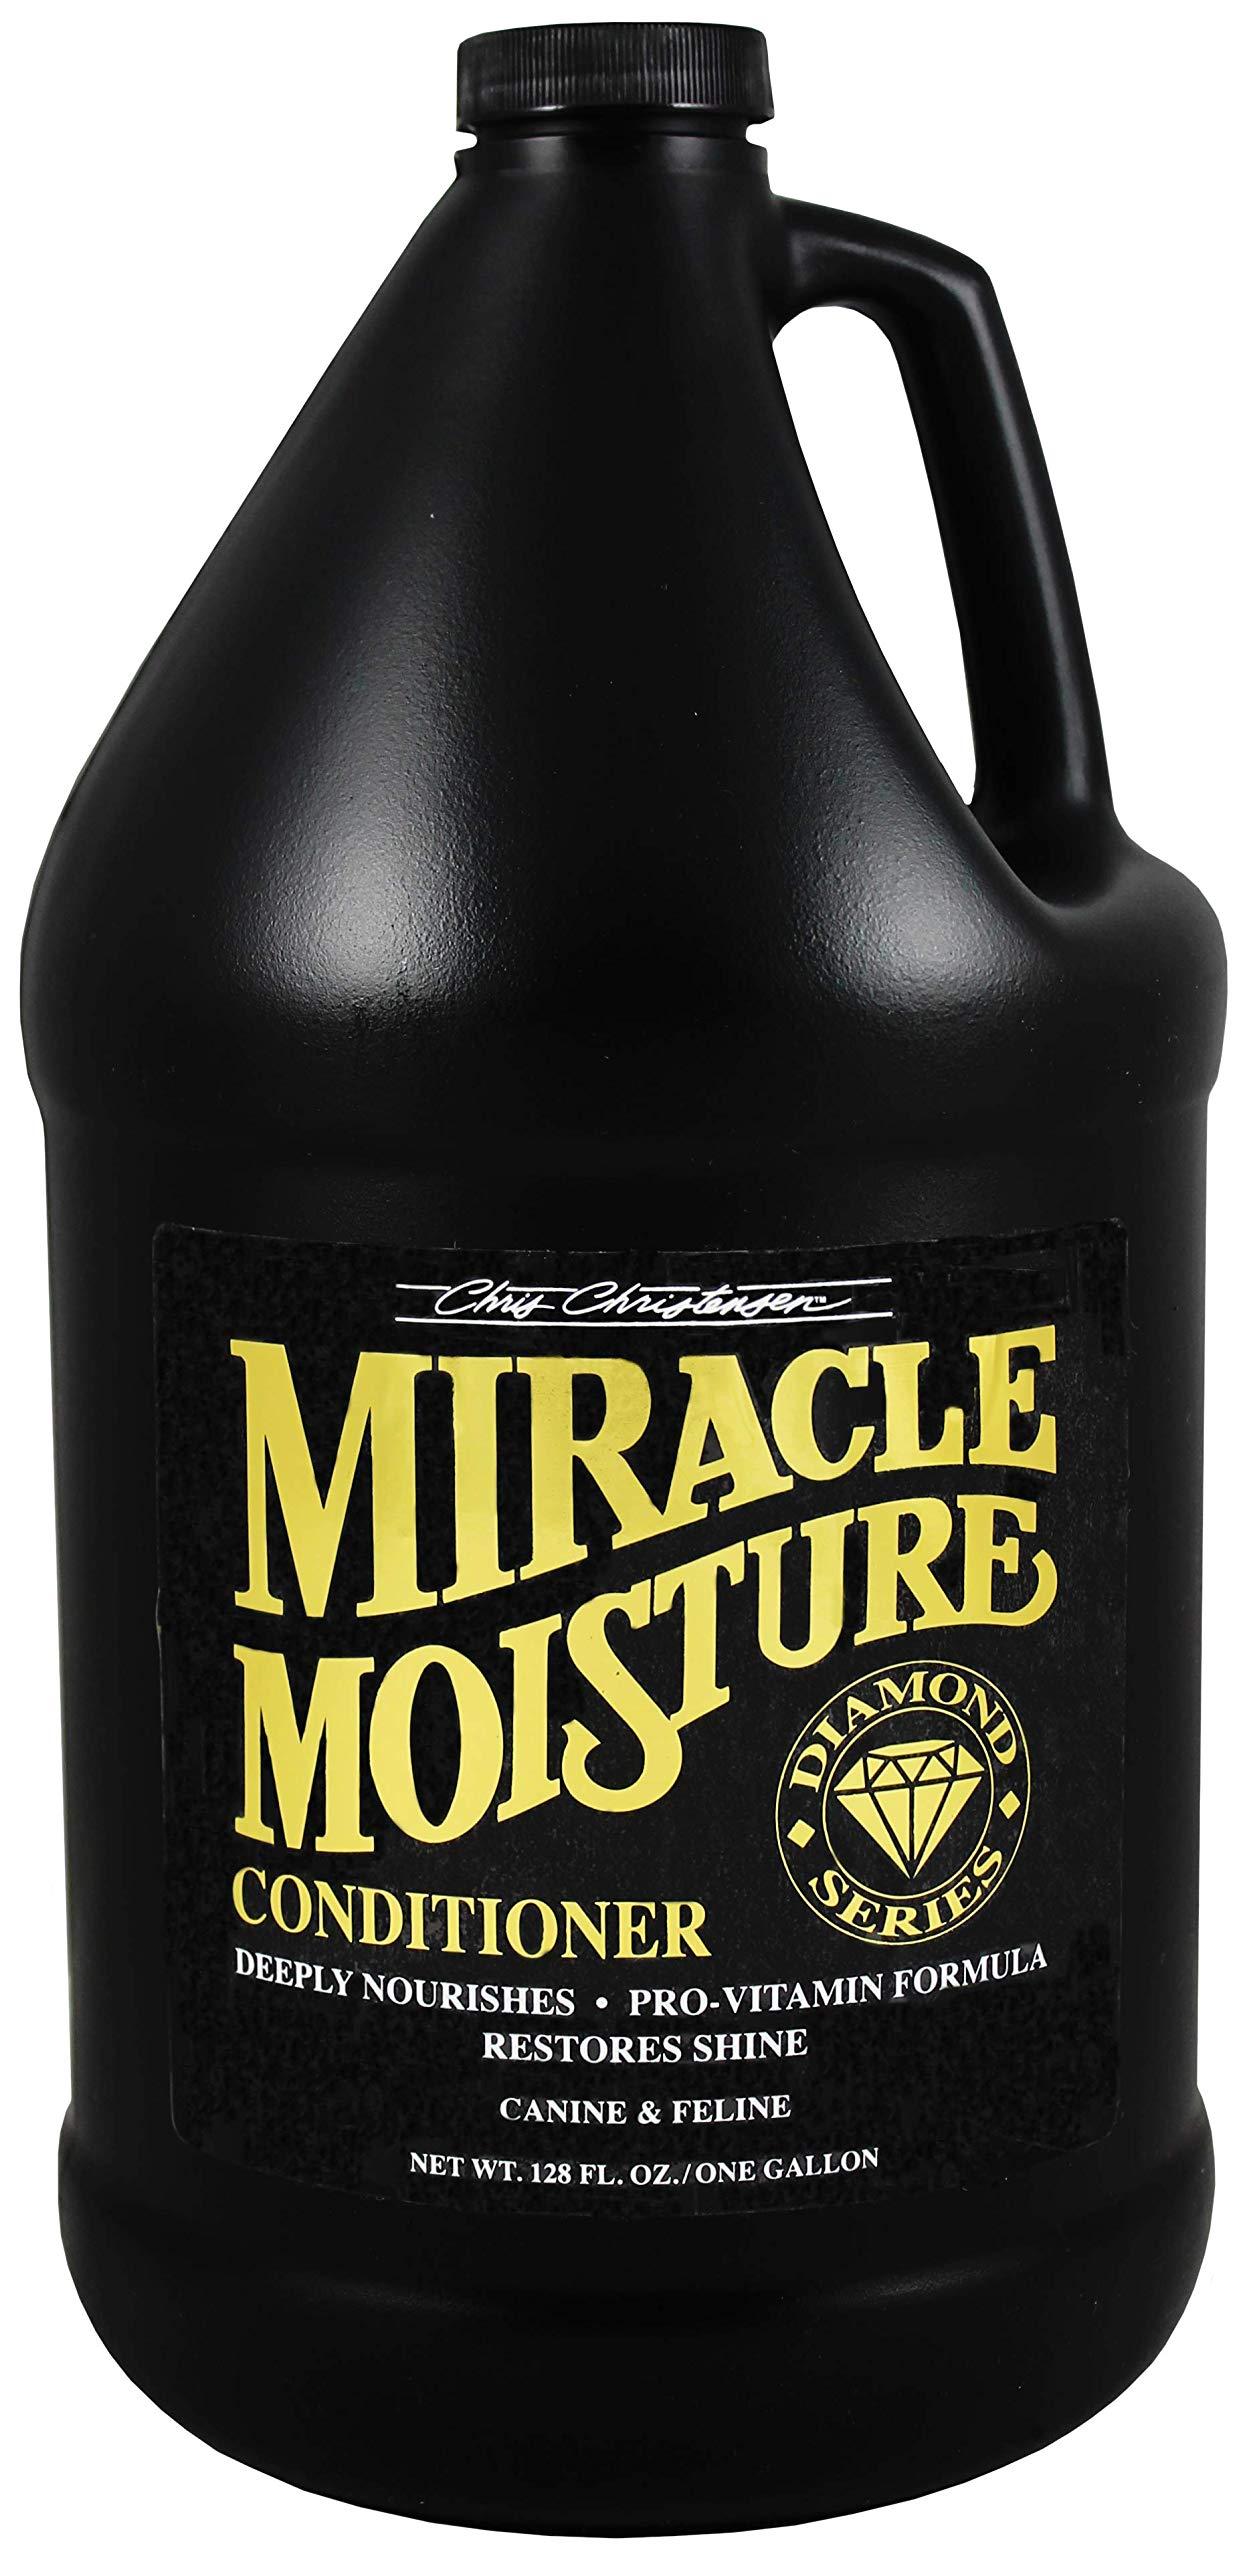 Chris Christensen Diamond Series Miracle Moisture Conditioner - Gallon by Chris Christensen